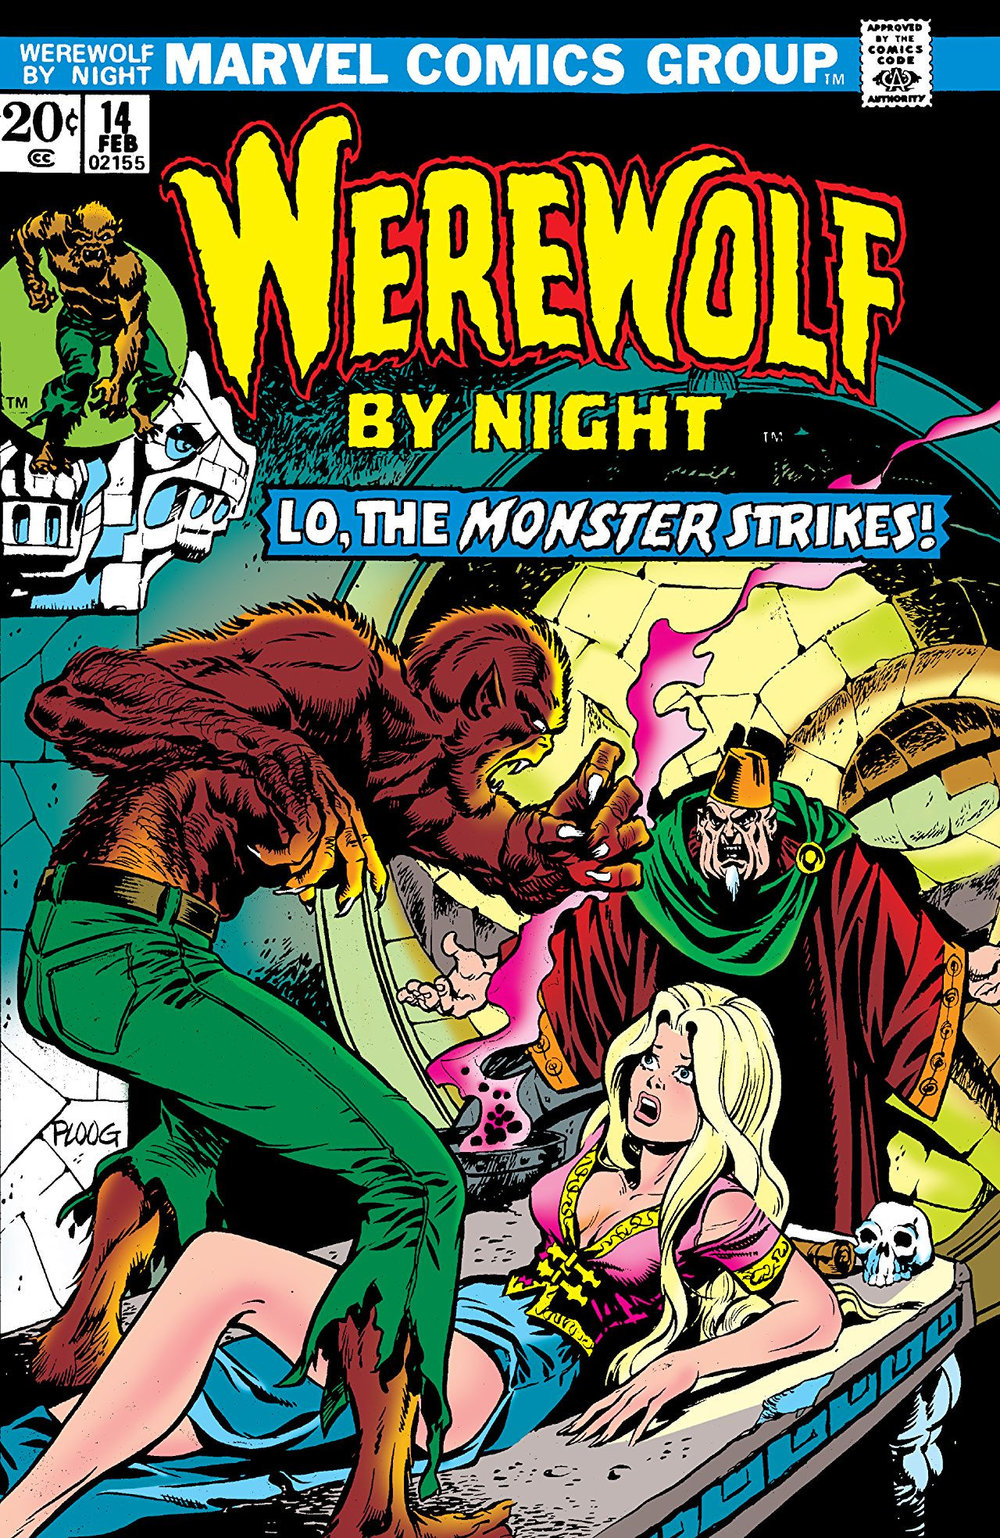 Werewolf_by_Night_Vol_1_14.jpg